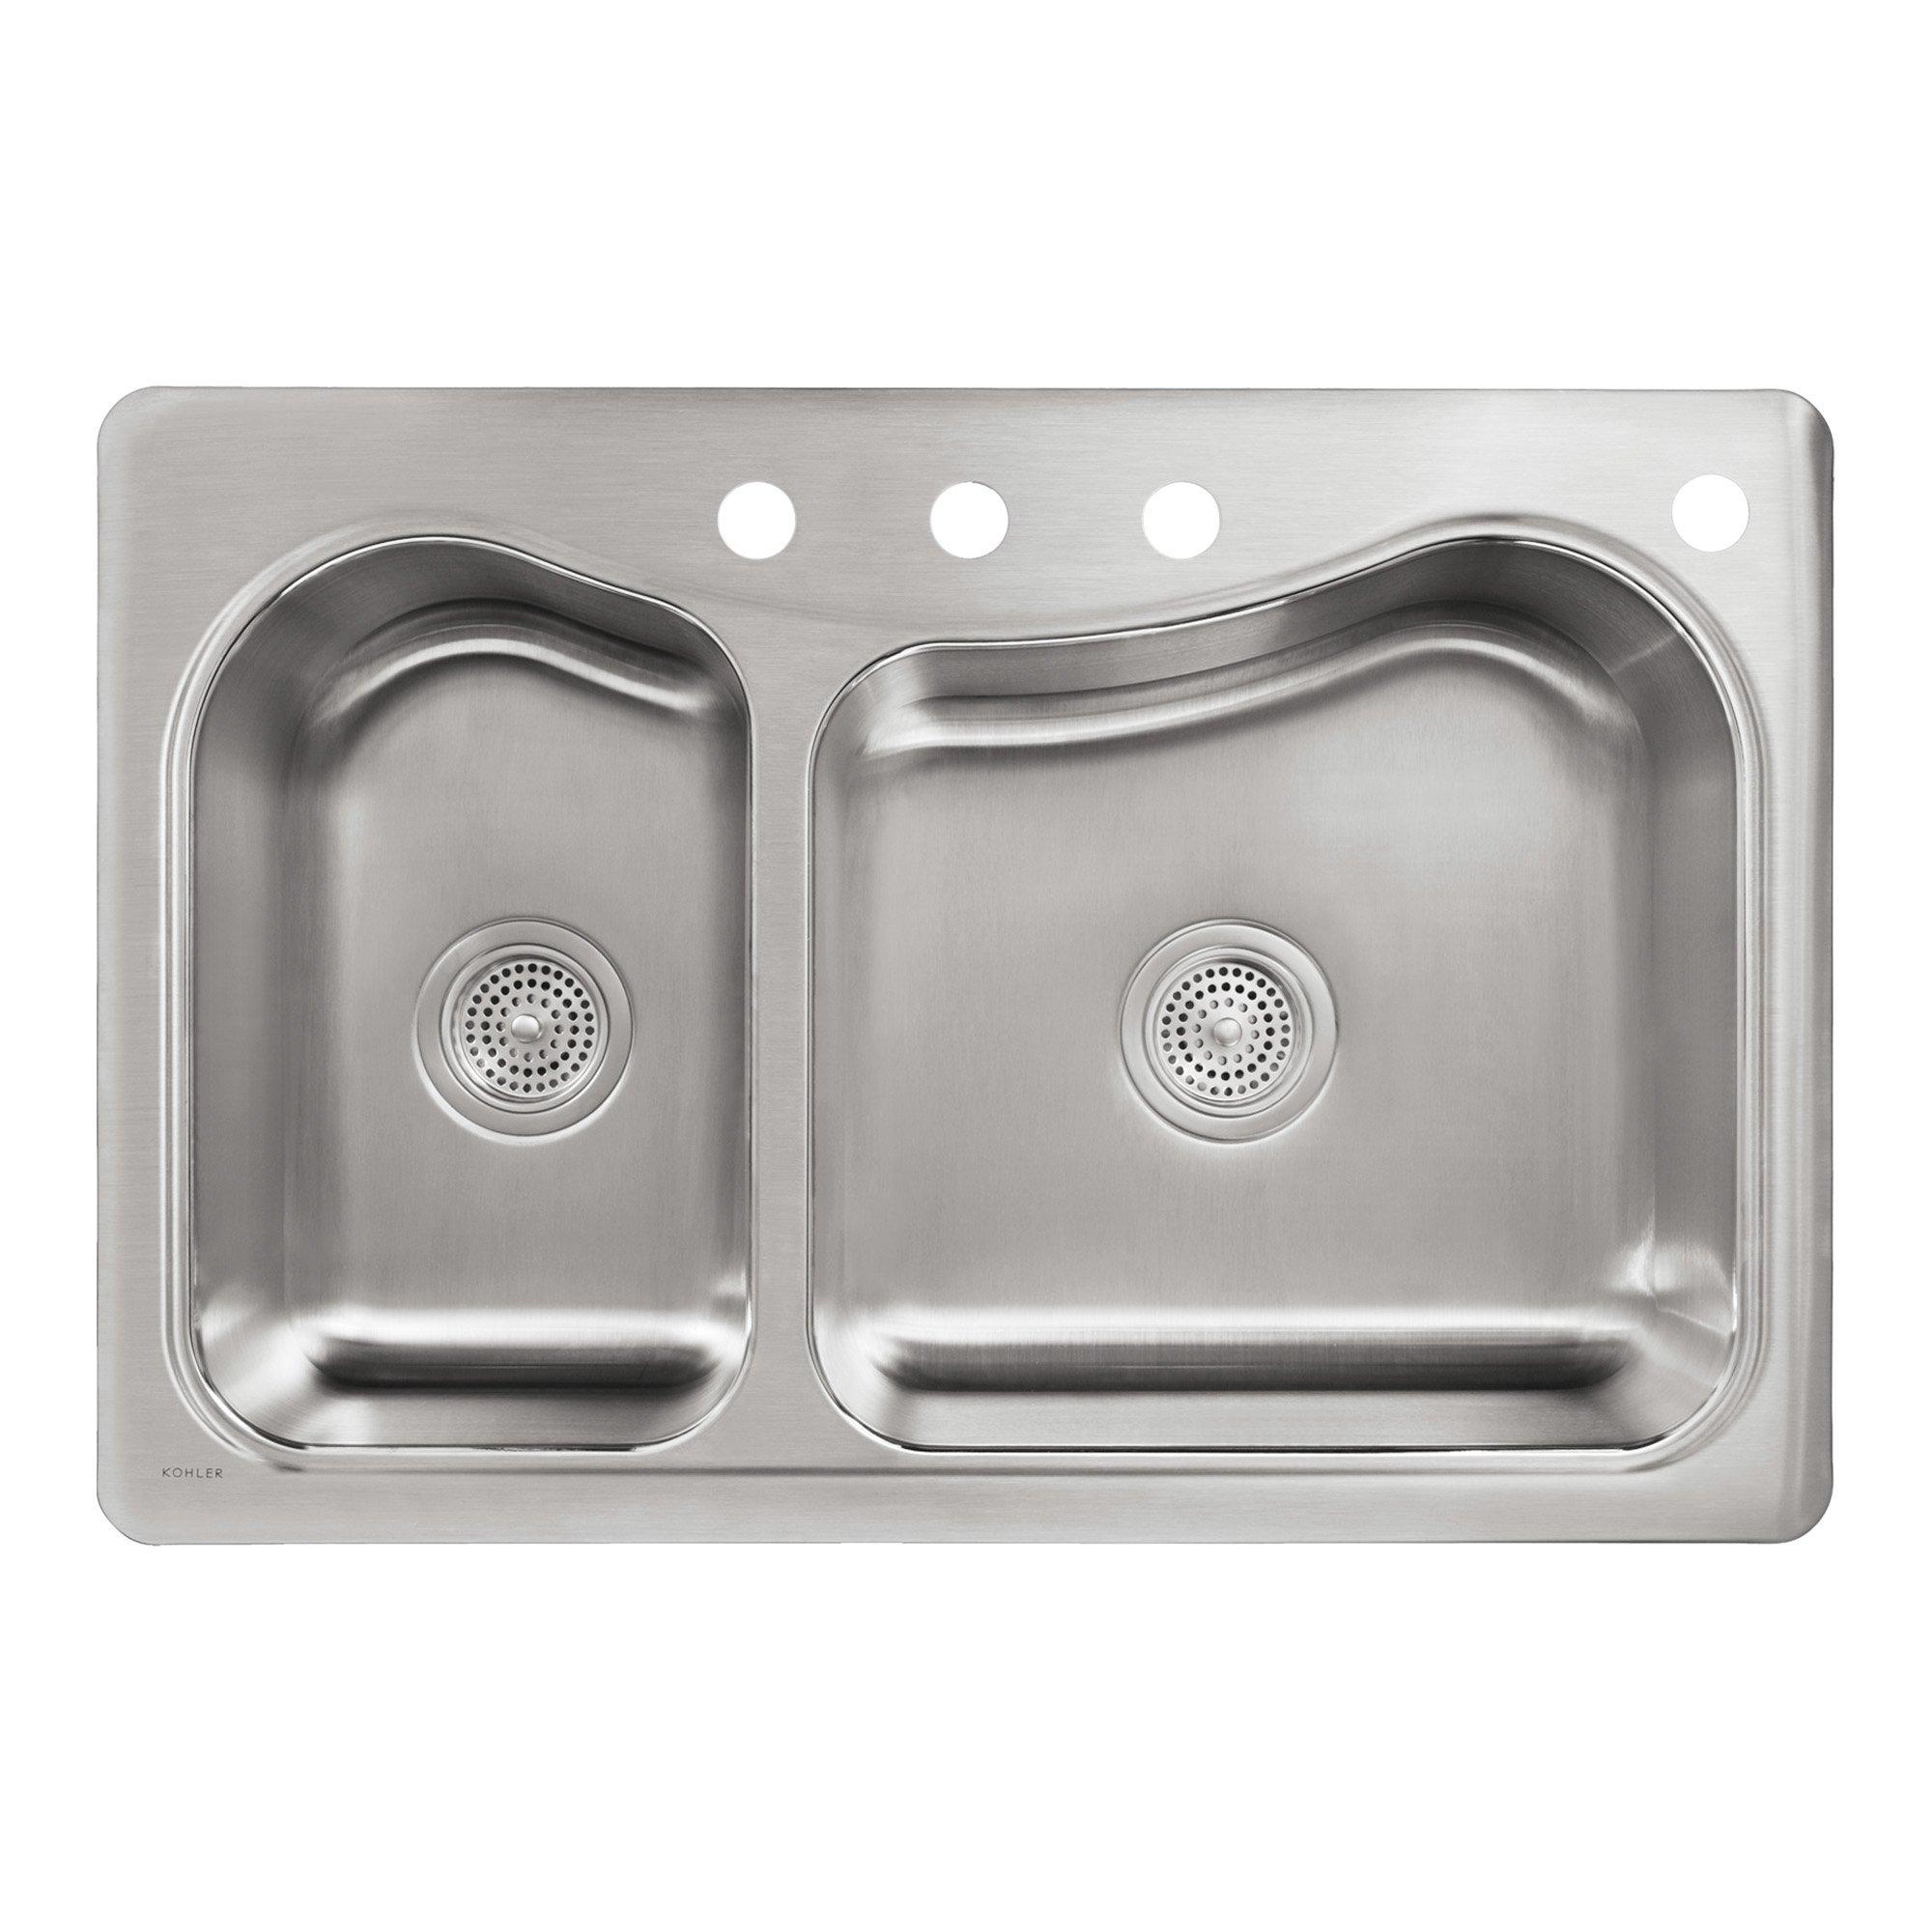 Kohler 33 Quot Topmount Stainless Steel Kitchen Sink Large